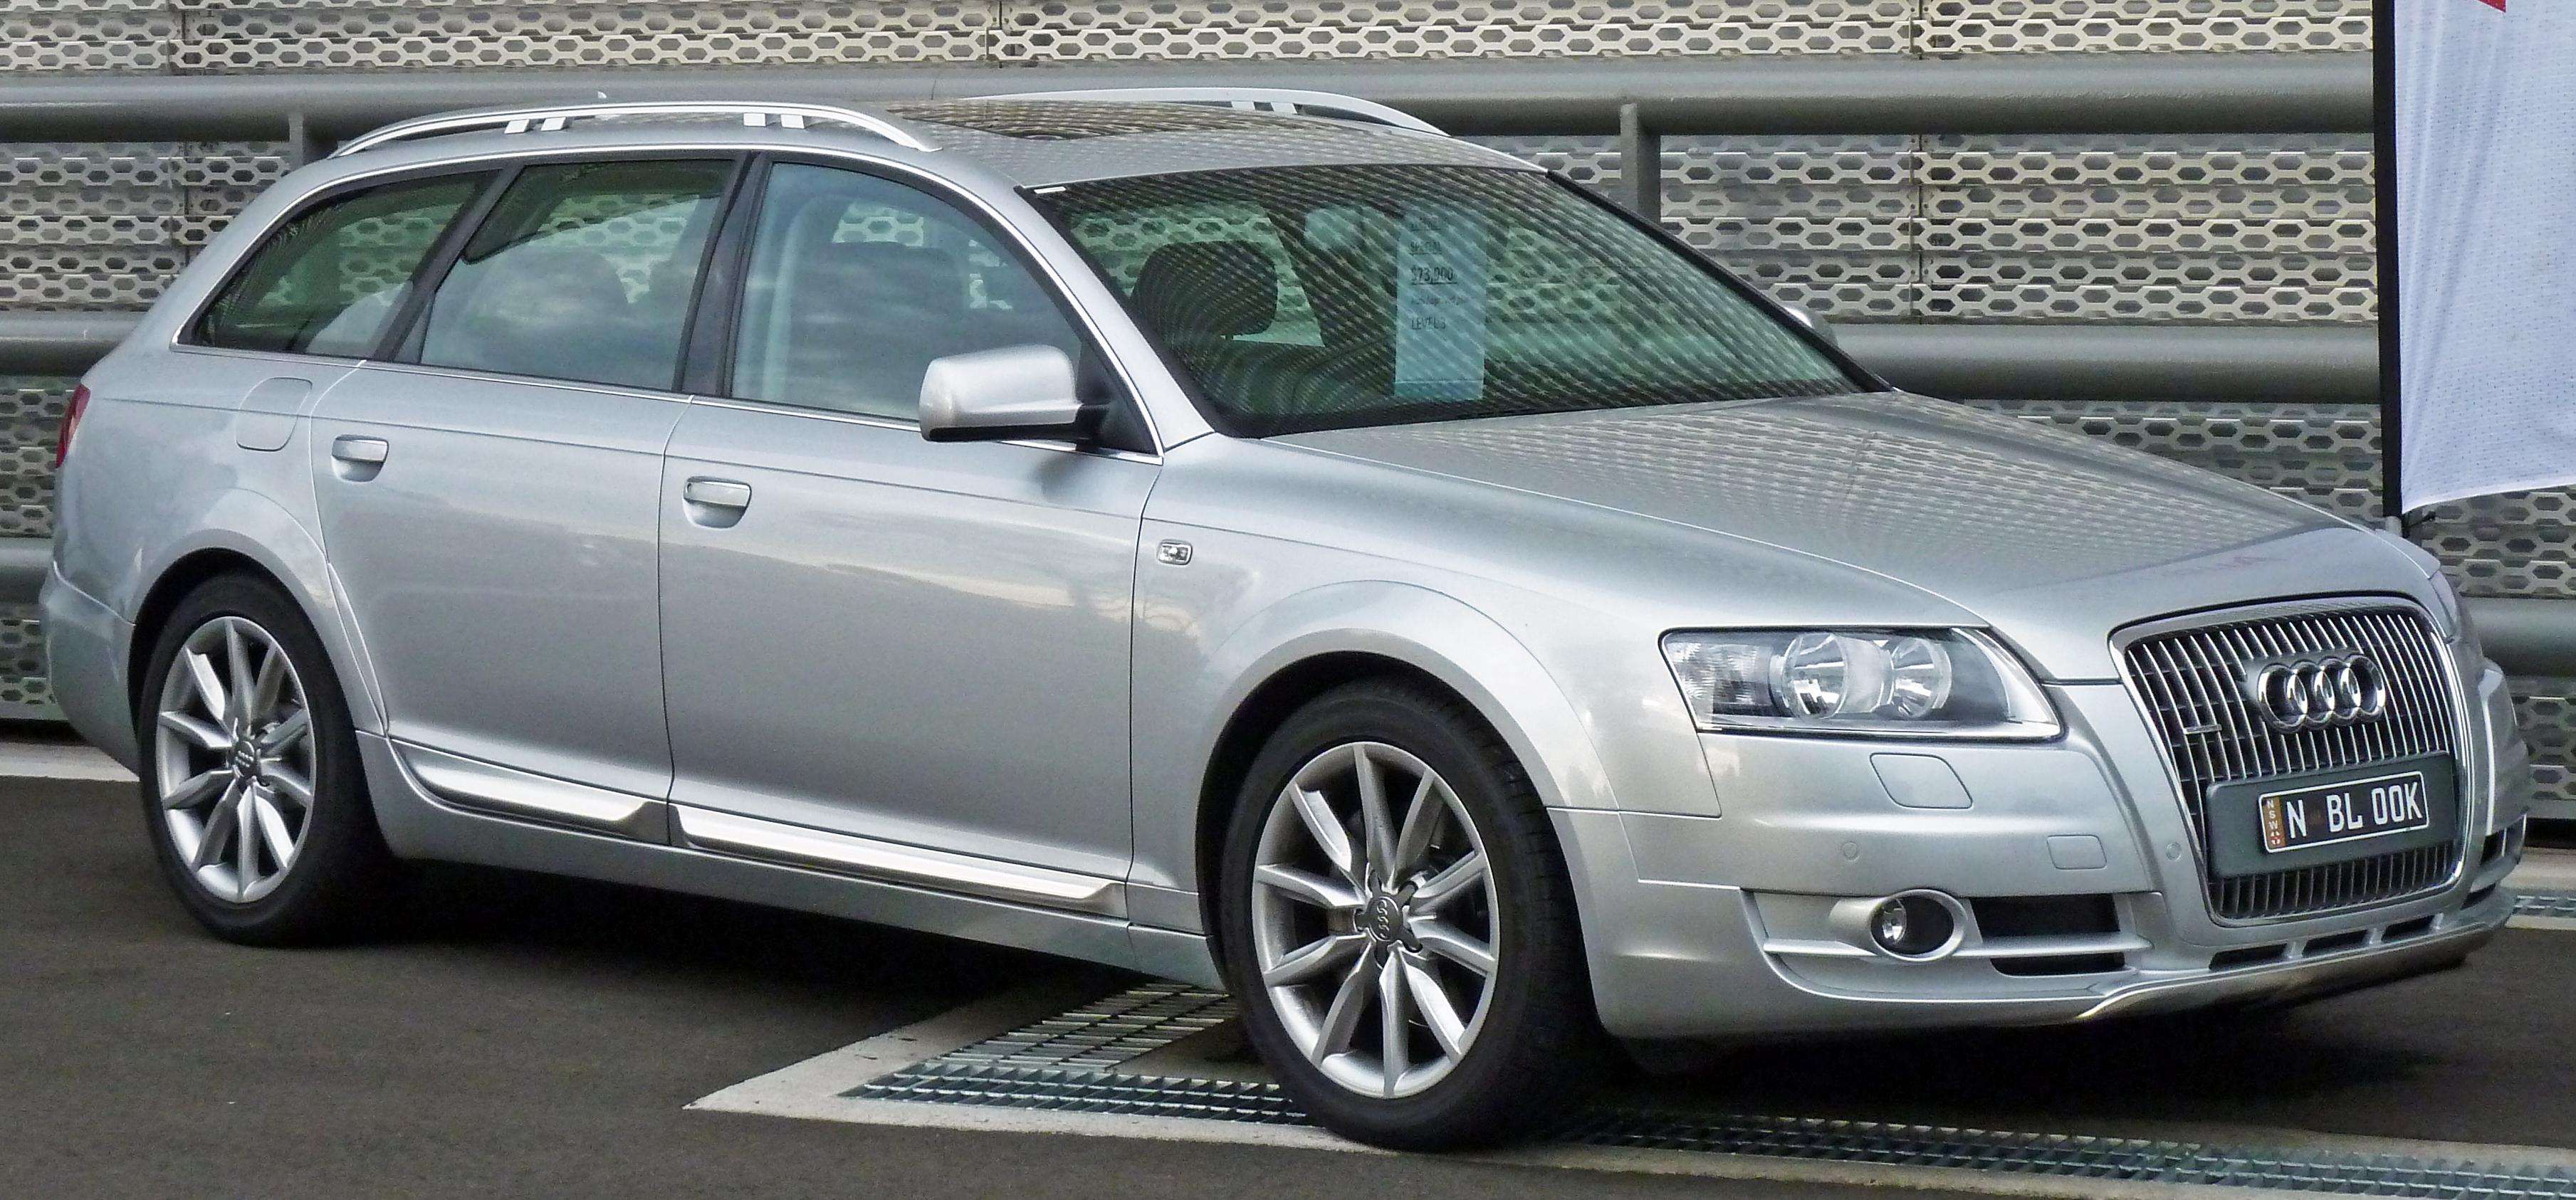 2007 Audi A6 Image 14